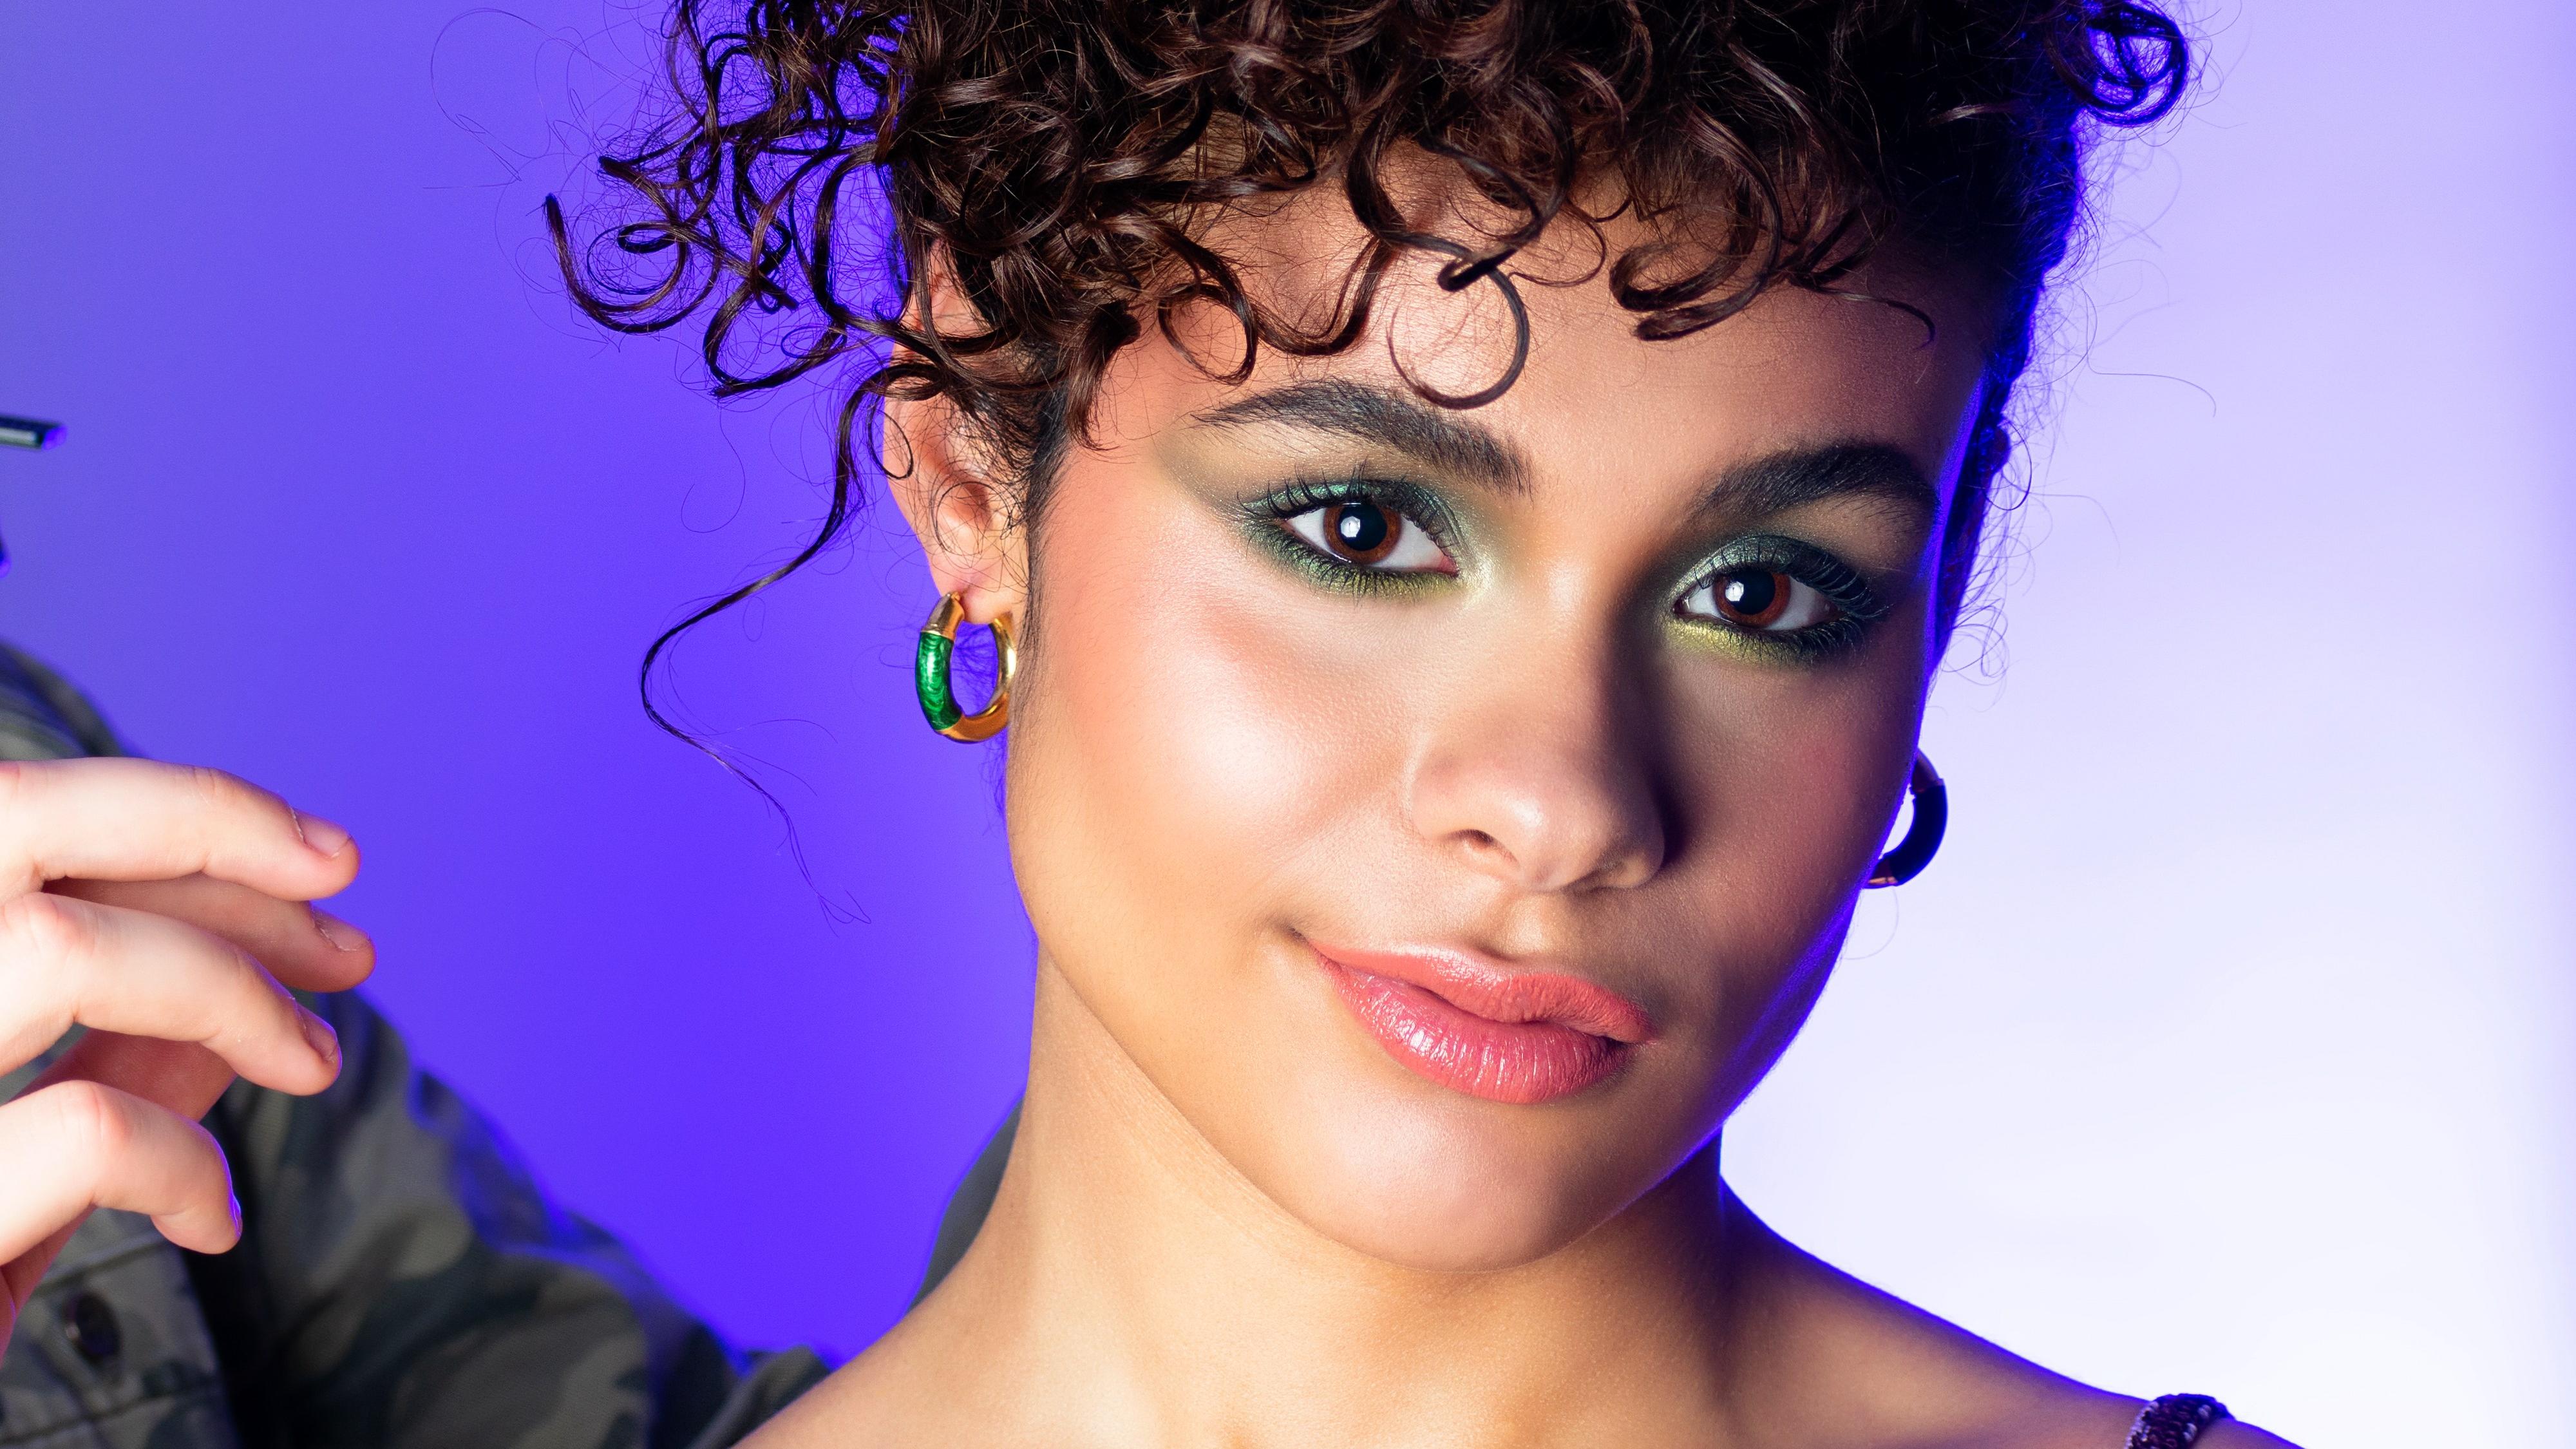 aleksandra rowicka twirling hair blog portrait model make up